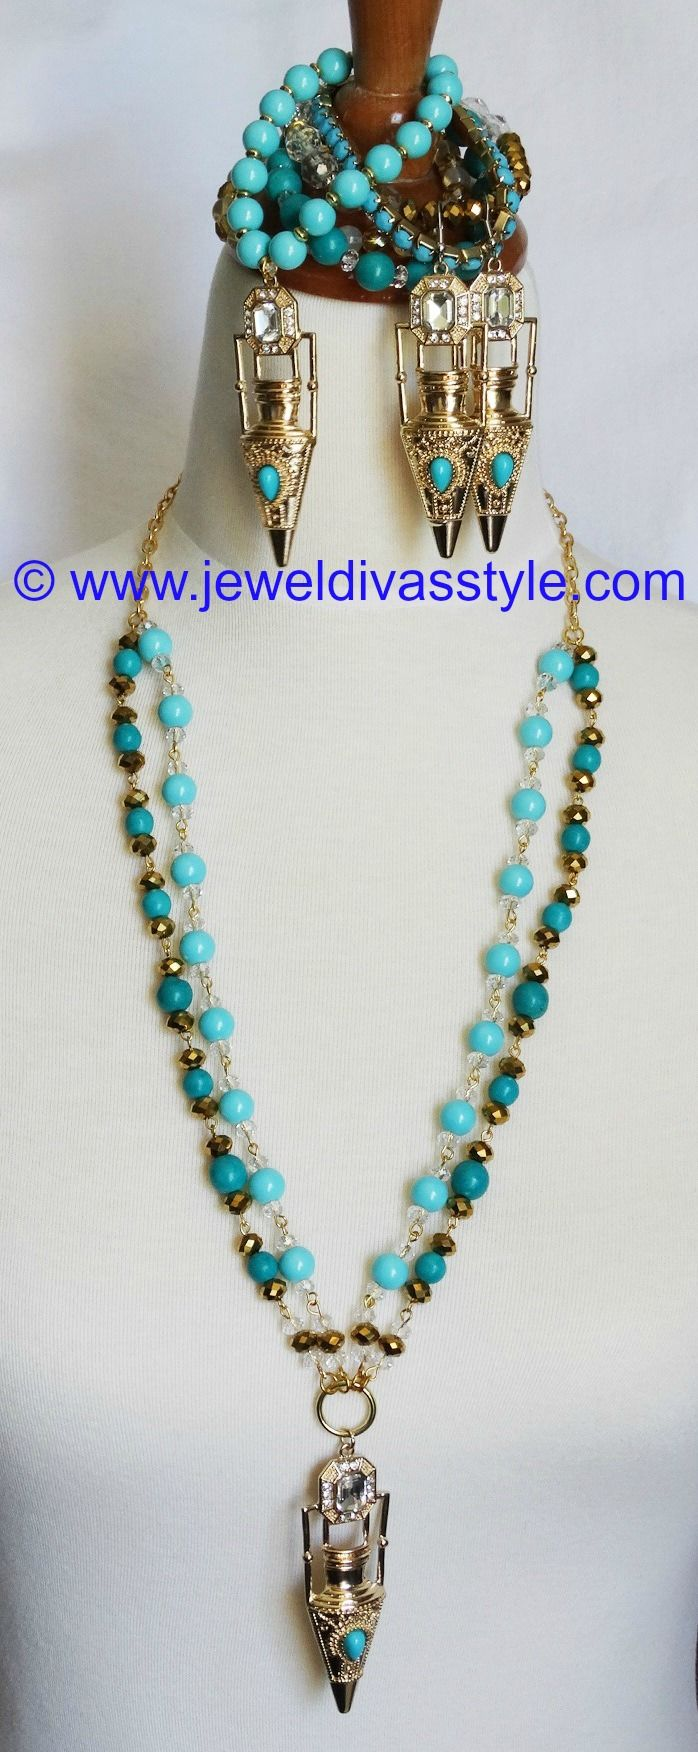 JDS - ARABIAN MEMOIRS JEWELLERY SET (JEWEL DIVAS necklace & bracelet stack) - http://jeweldivasstyle.com/designer-inspired-arabian-memoirs-set/